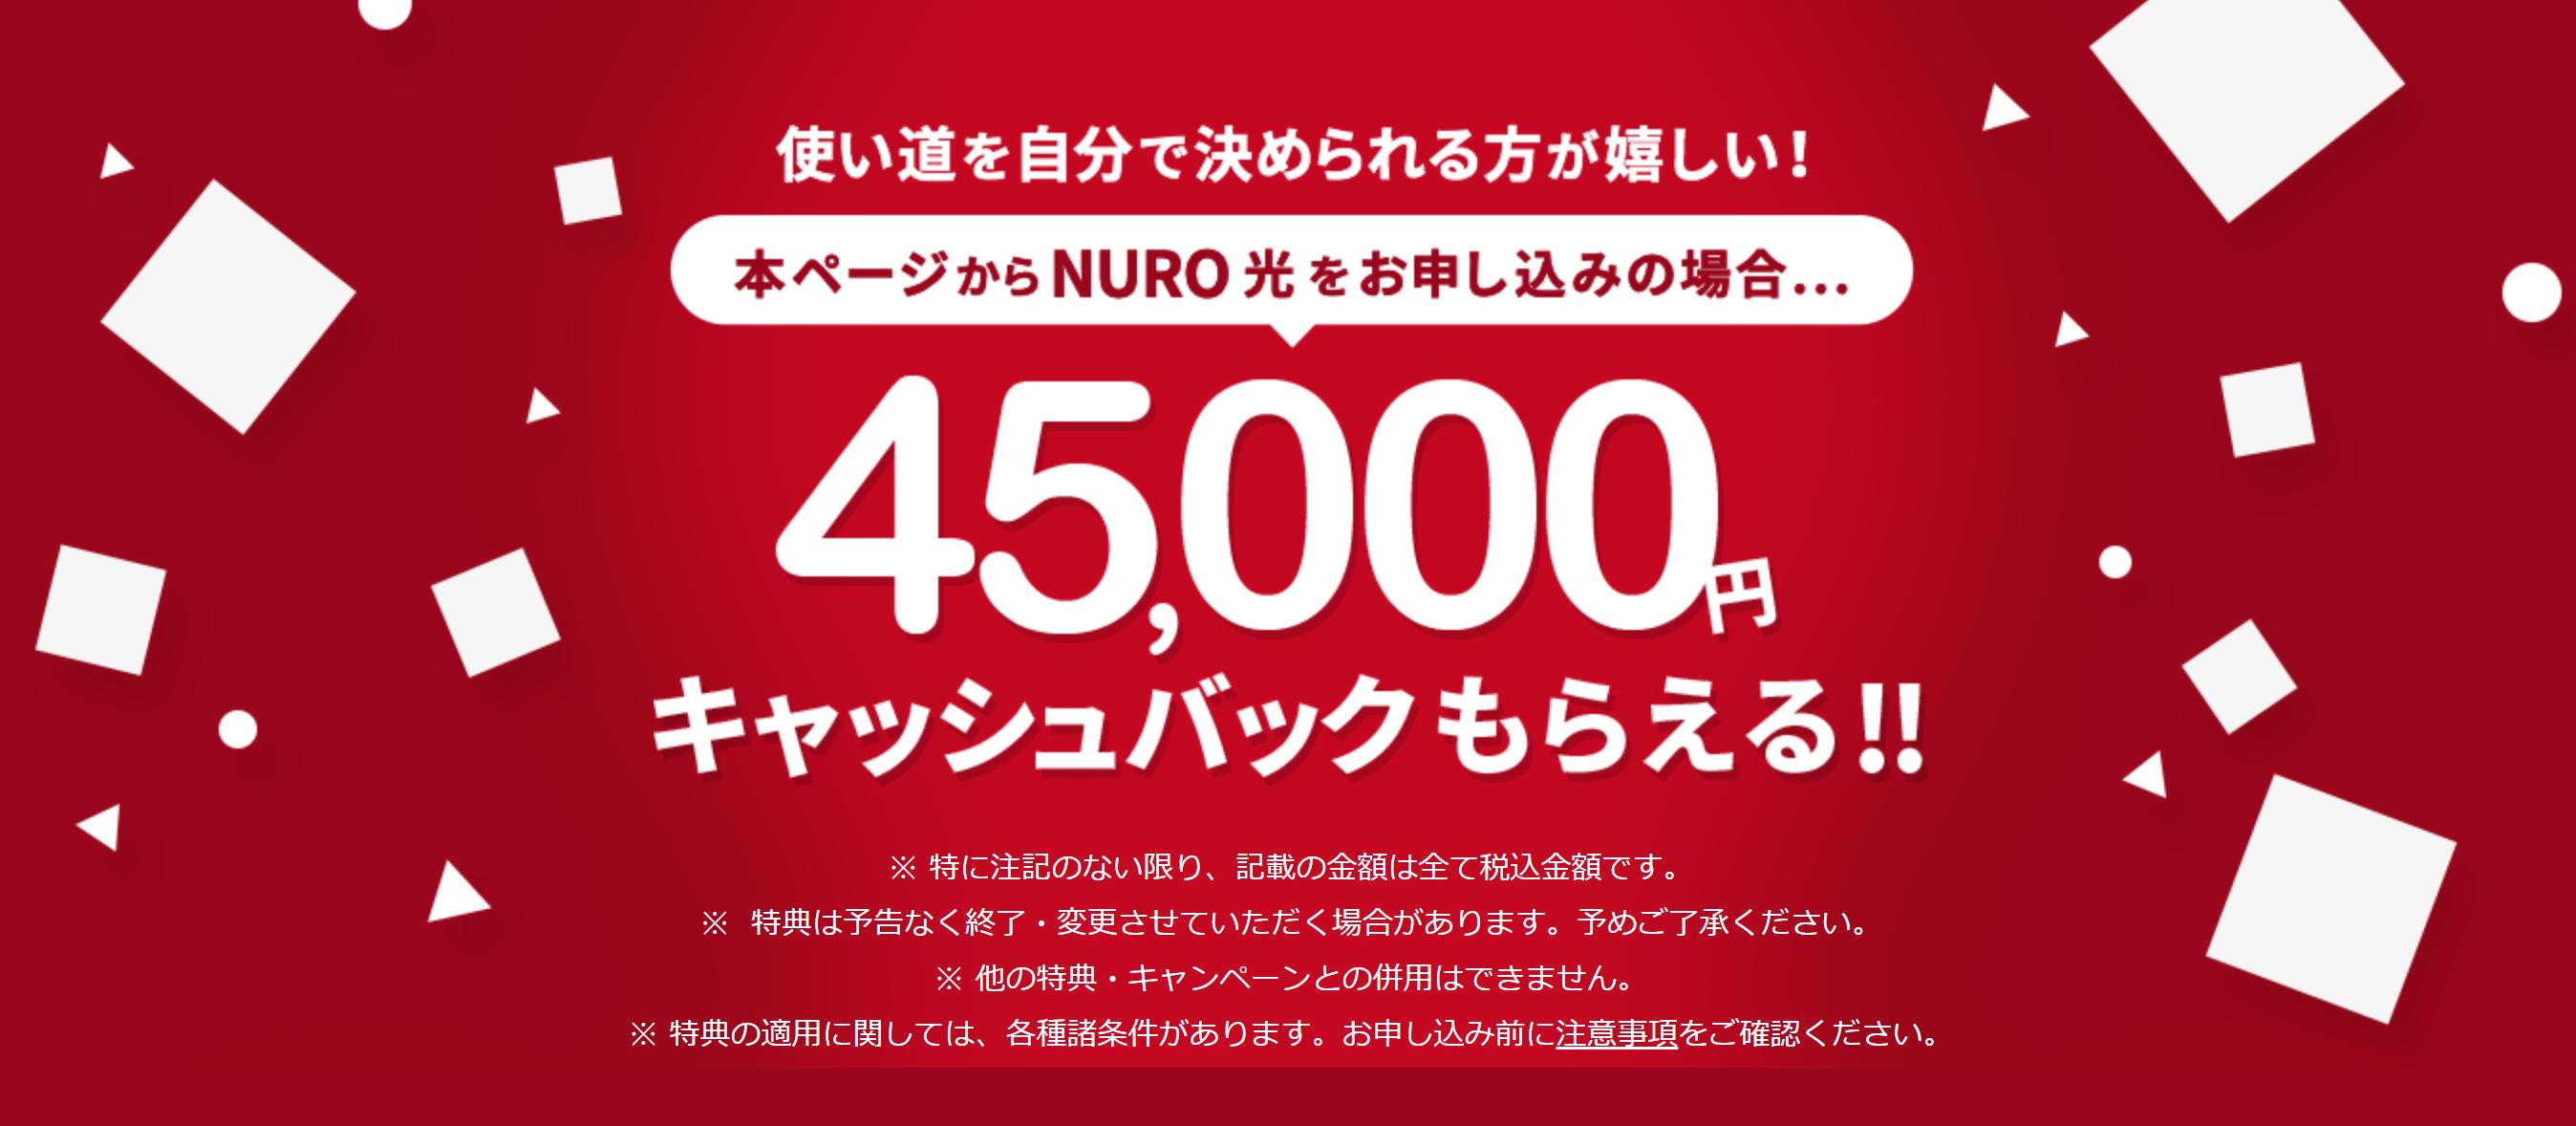 NURO光 キャッシュバック 45000円